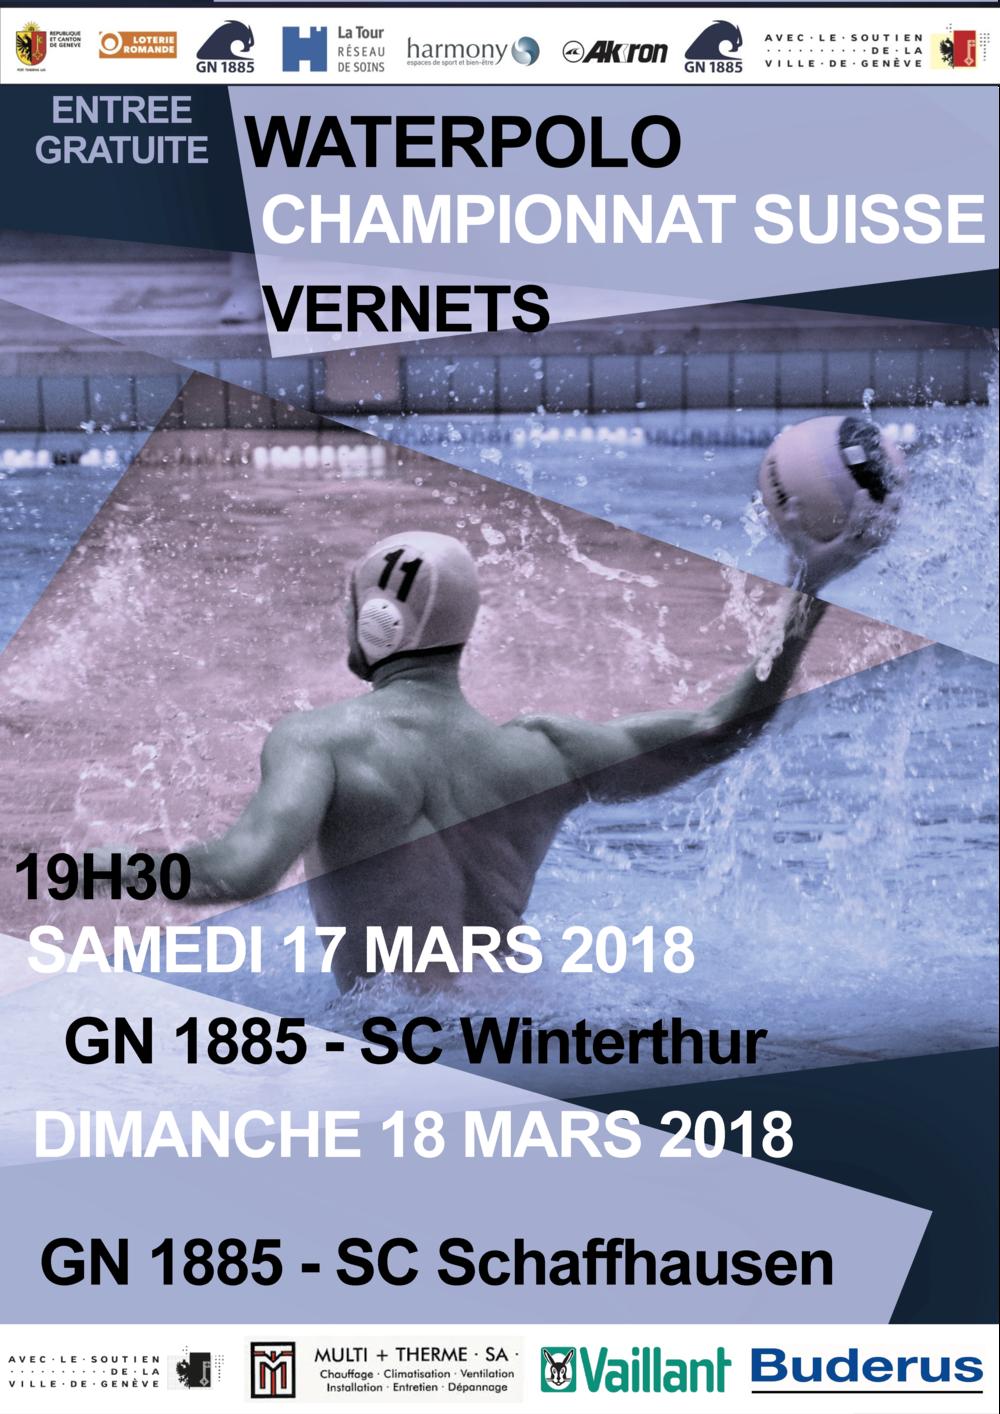 affiche match GIMP 17 - 18 mars 2018.png